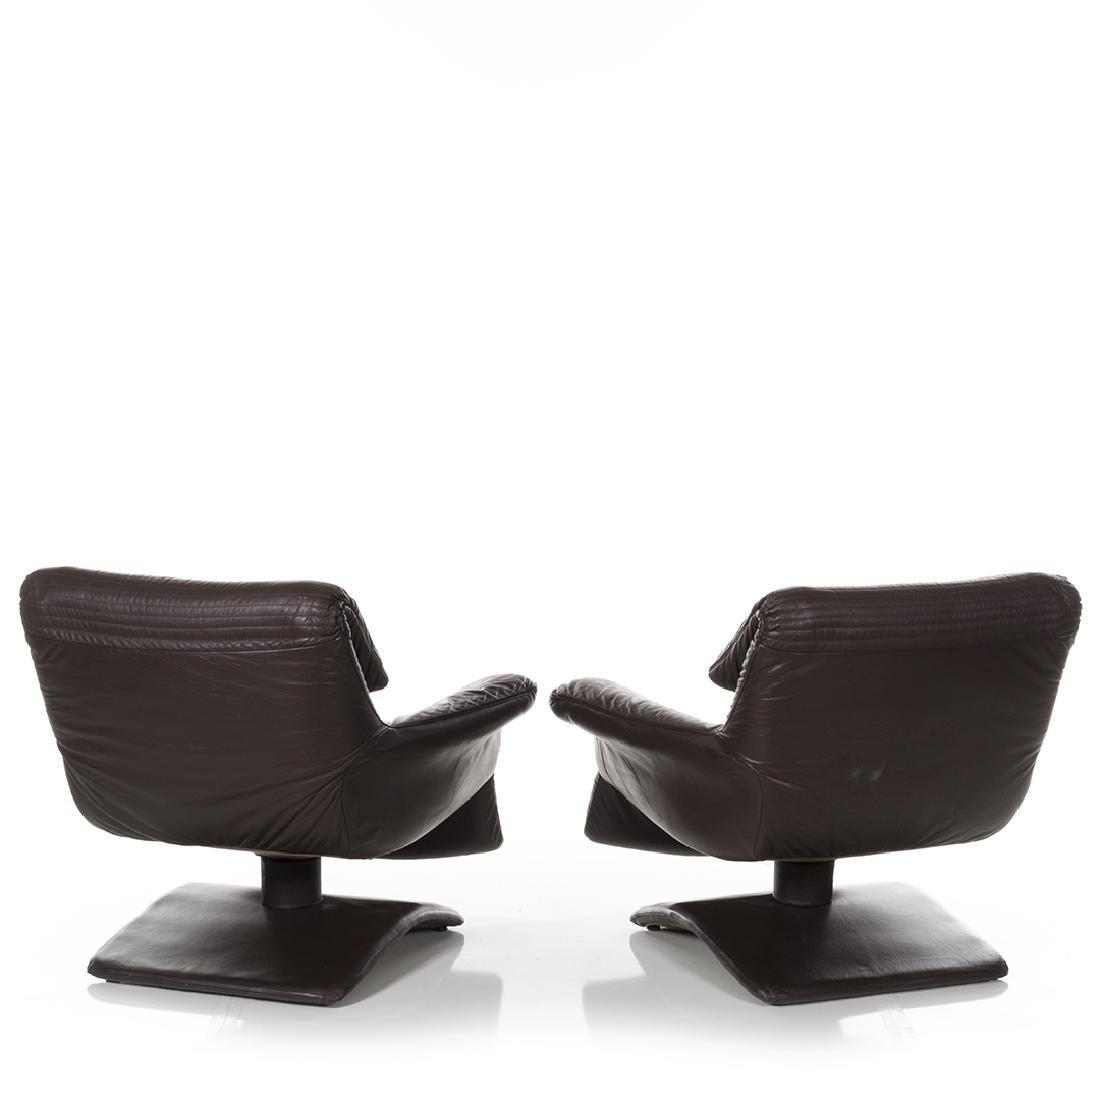 Scandinavian Leather Club Chairs (2) - 4